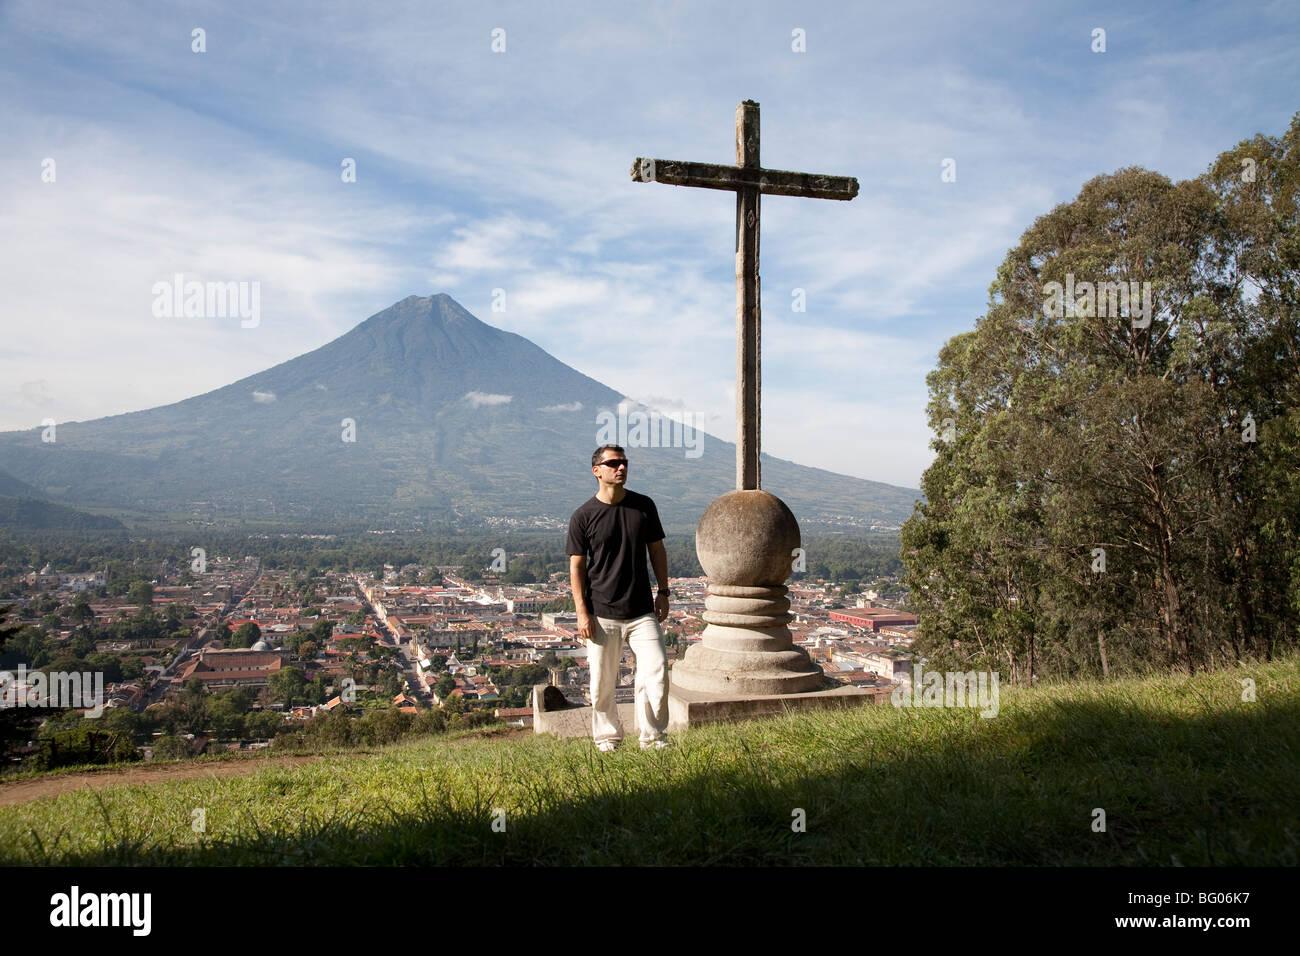 Volcan Agua and the landmark Cerro de la Cruz viewpoint and view over Antigua Guatemala. - Stock Image